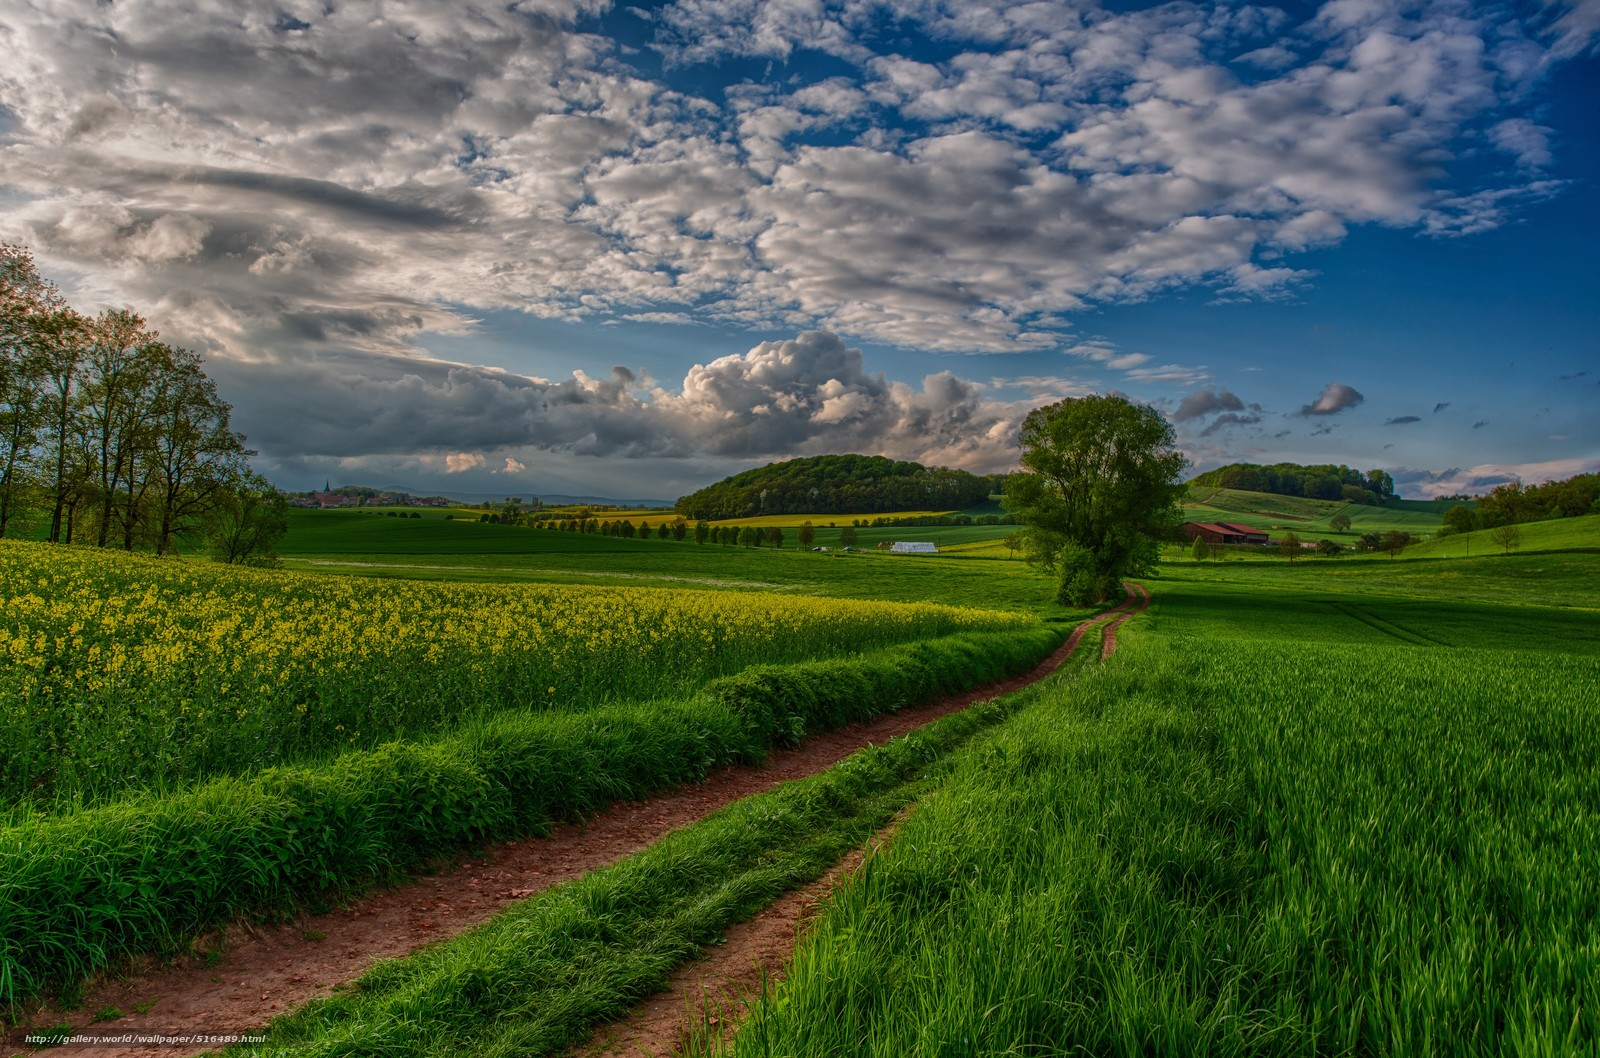 Download wallpaper nature landscape scenery view free desktop